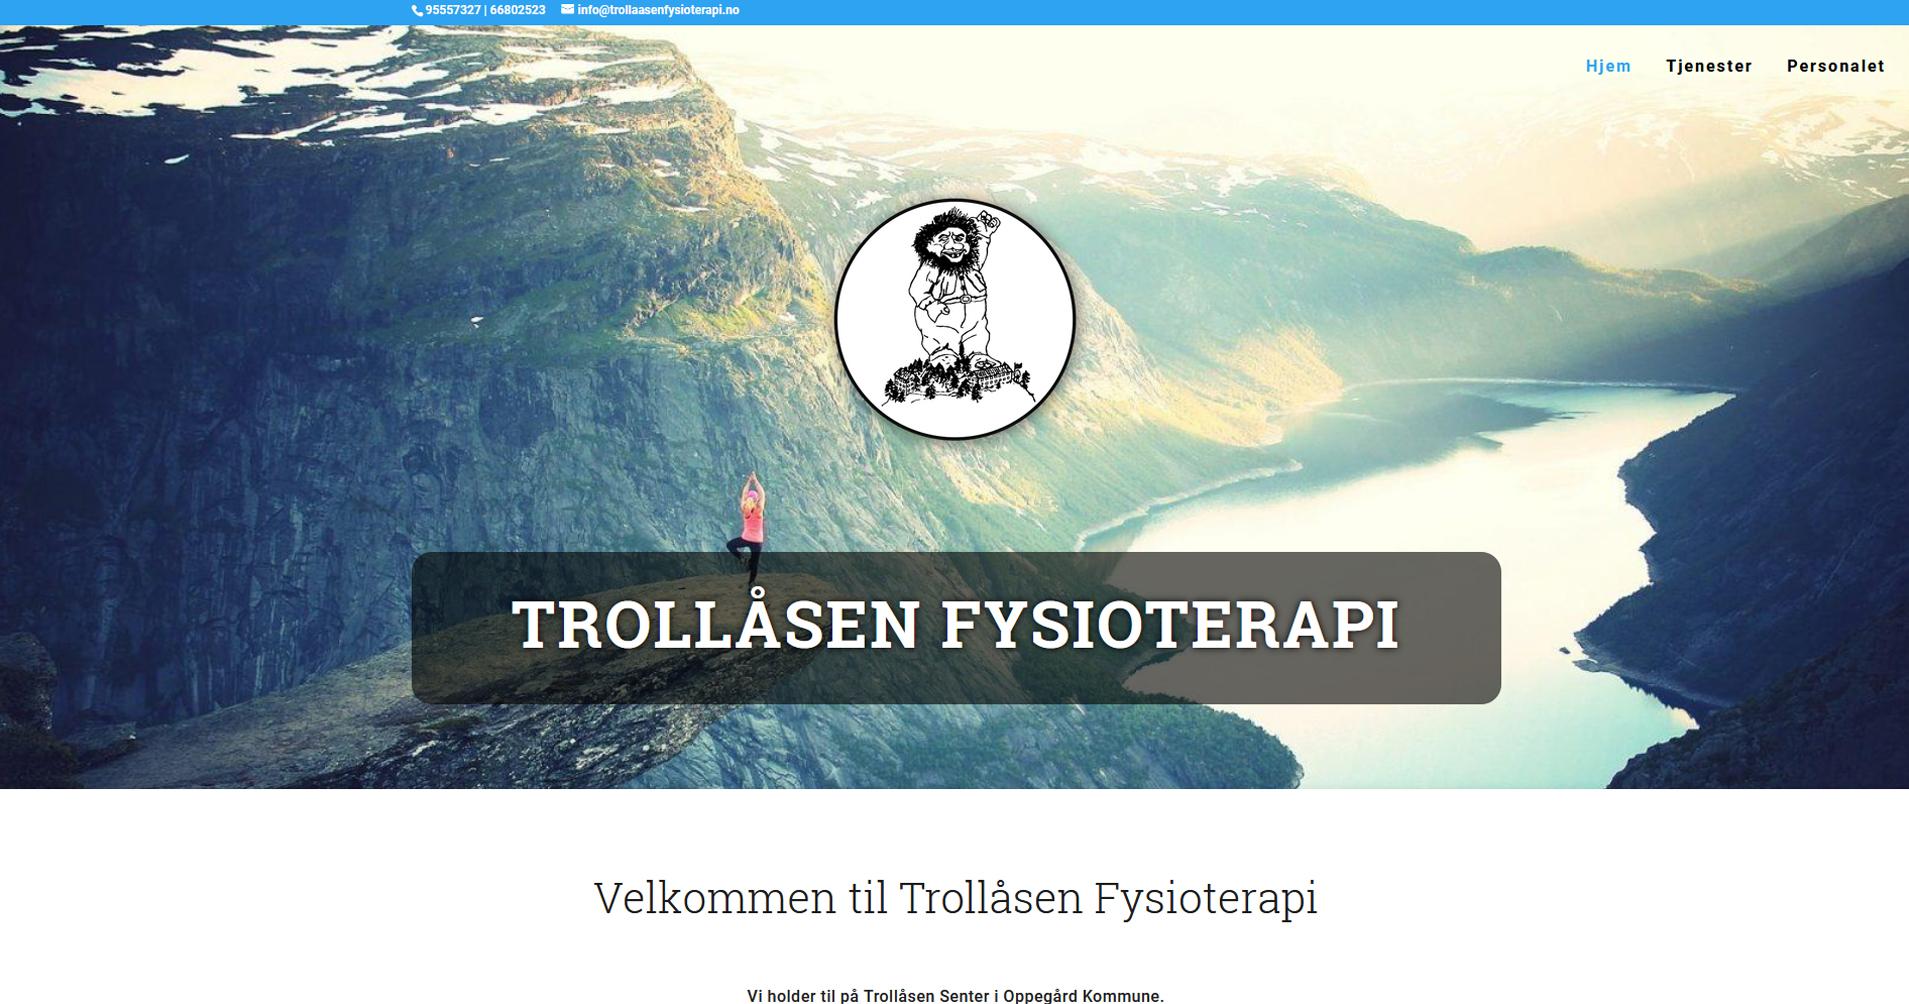 Trollåsen Fysioterapi - kunde hos metait.no